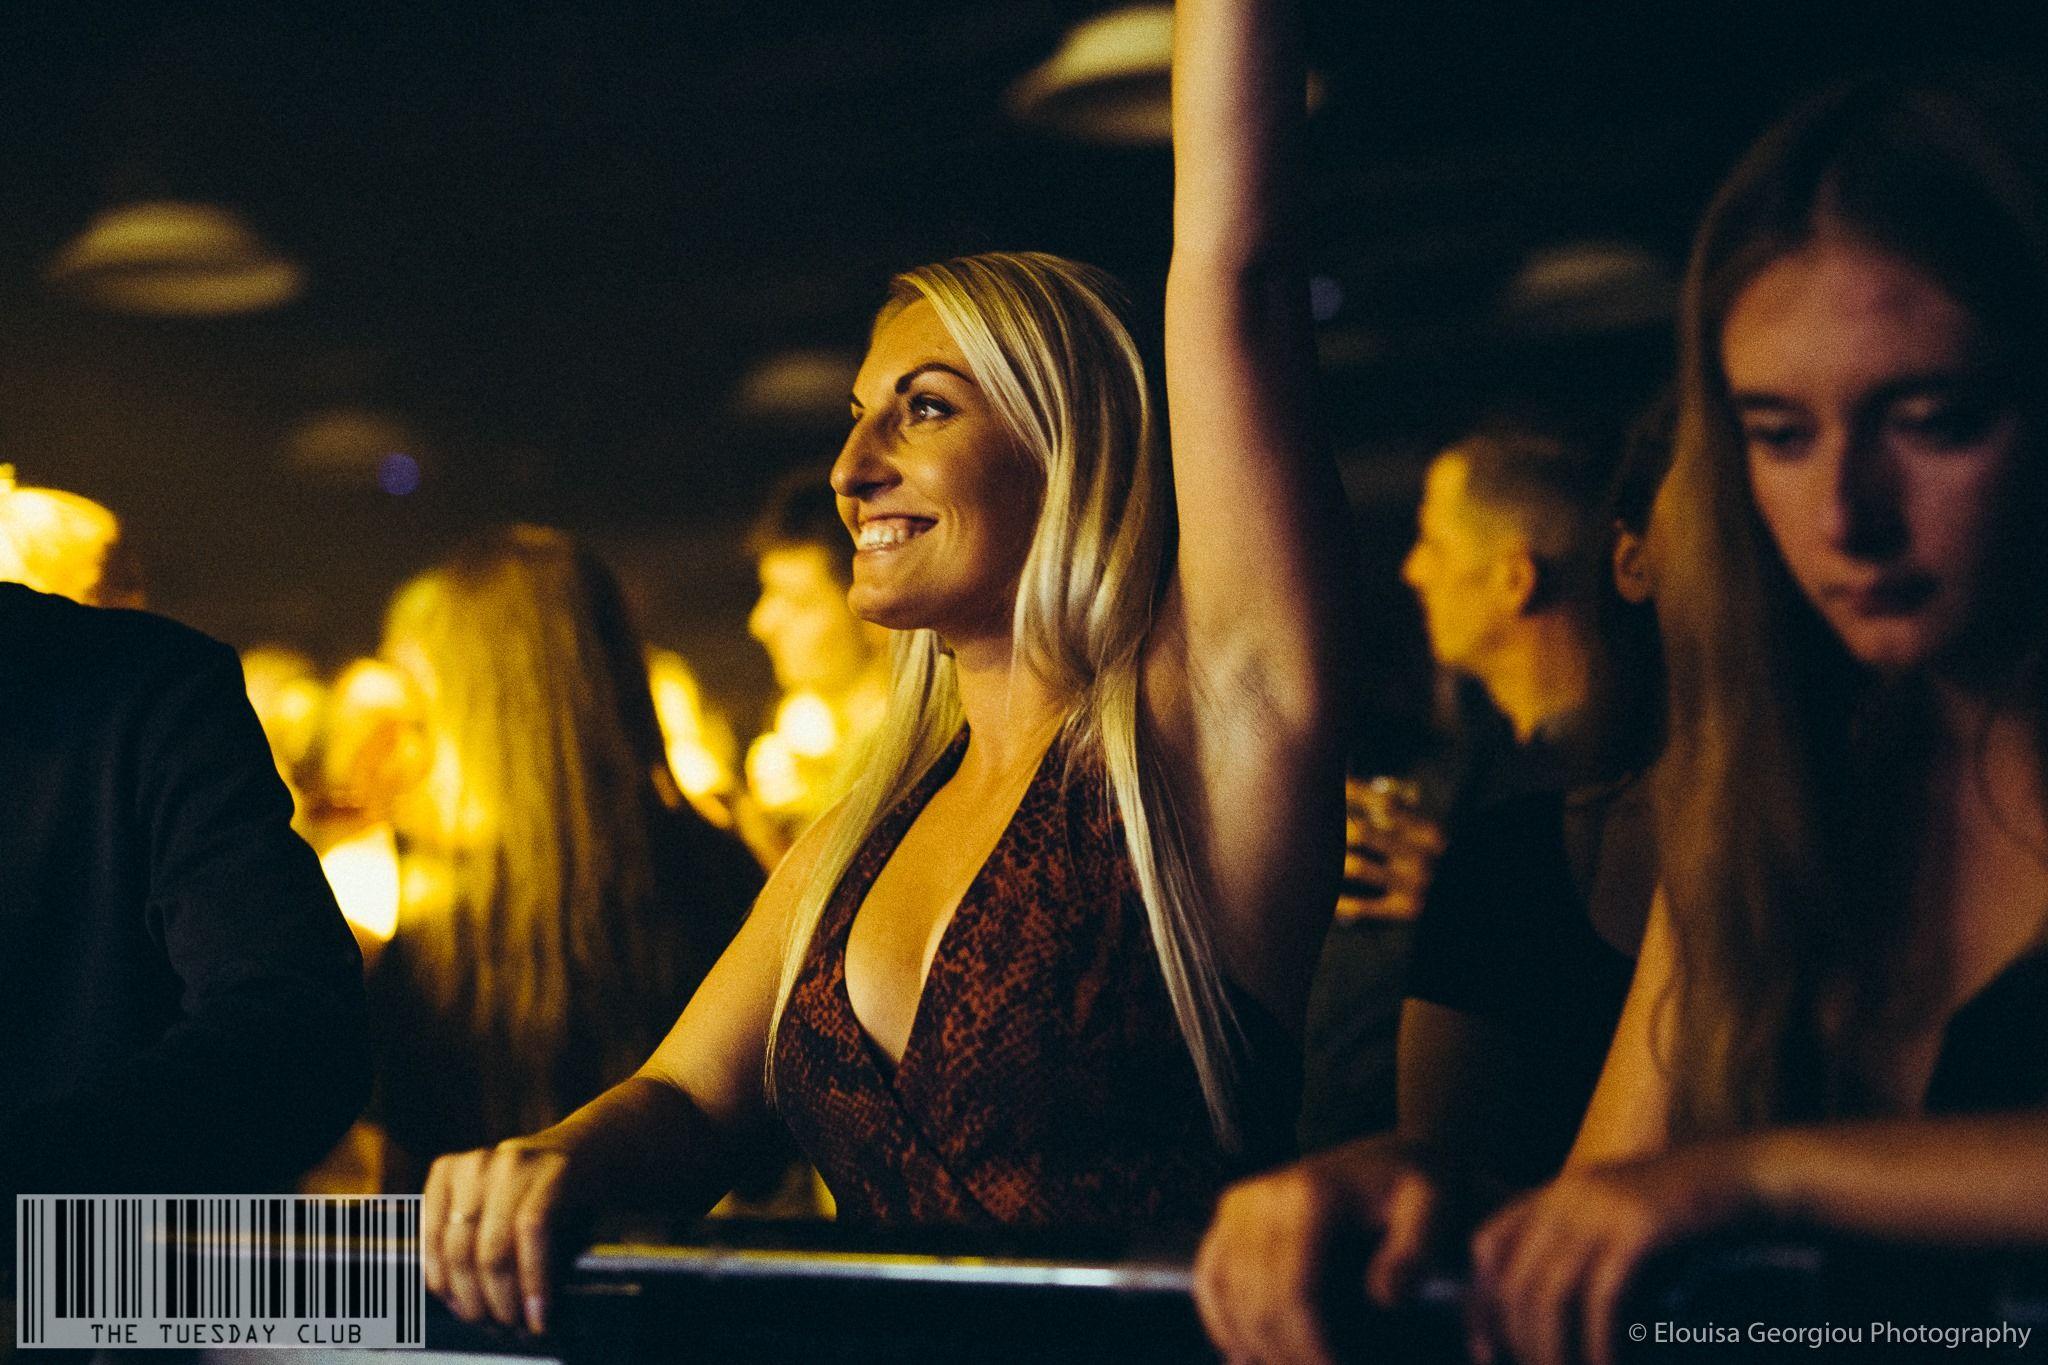 Image may contain: Bar Counter, Pub, Night Life, Night Club, Club, Person, Human